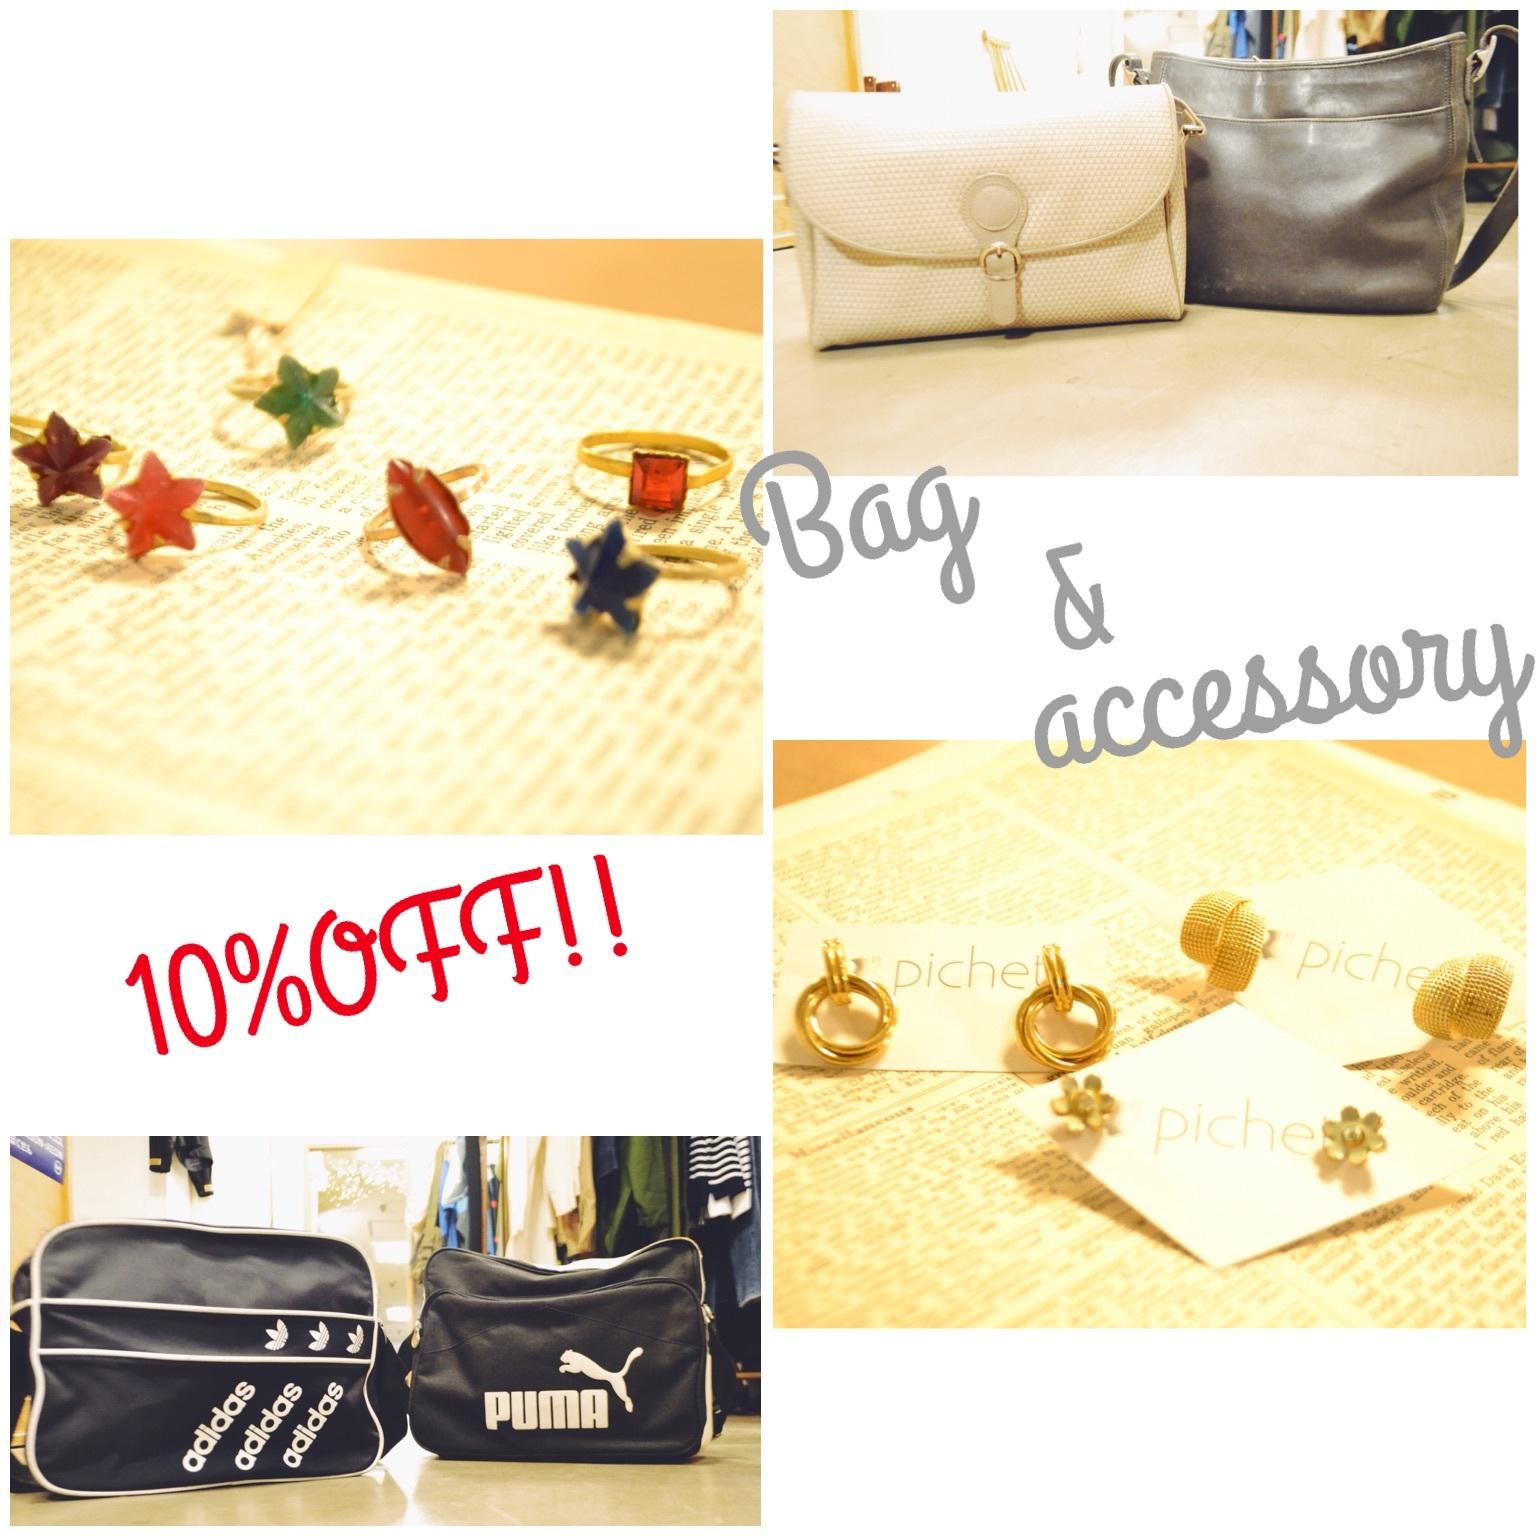 bag & accessory sale day !_a0220798_11192739.jpg